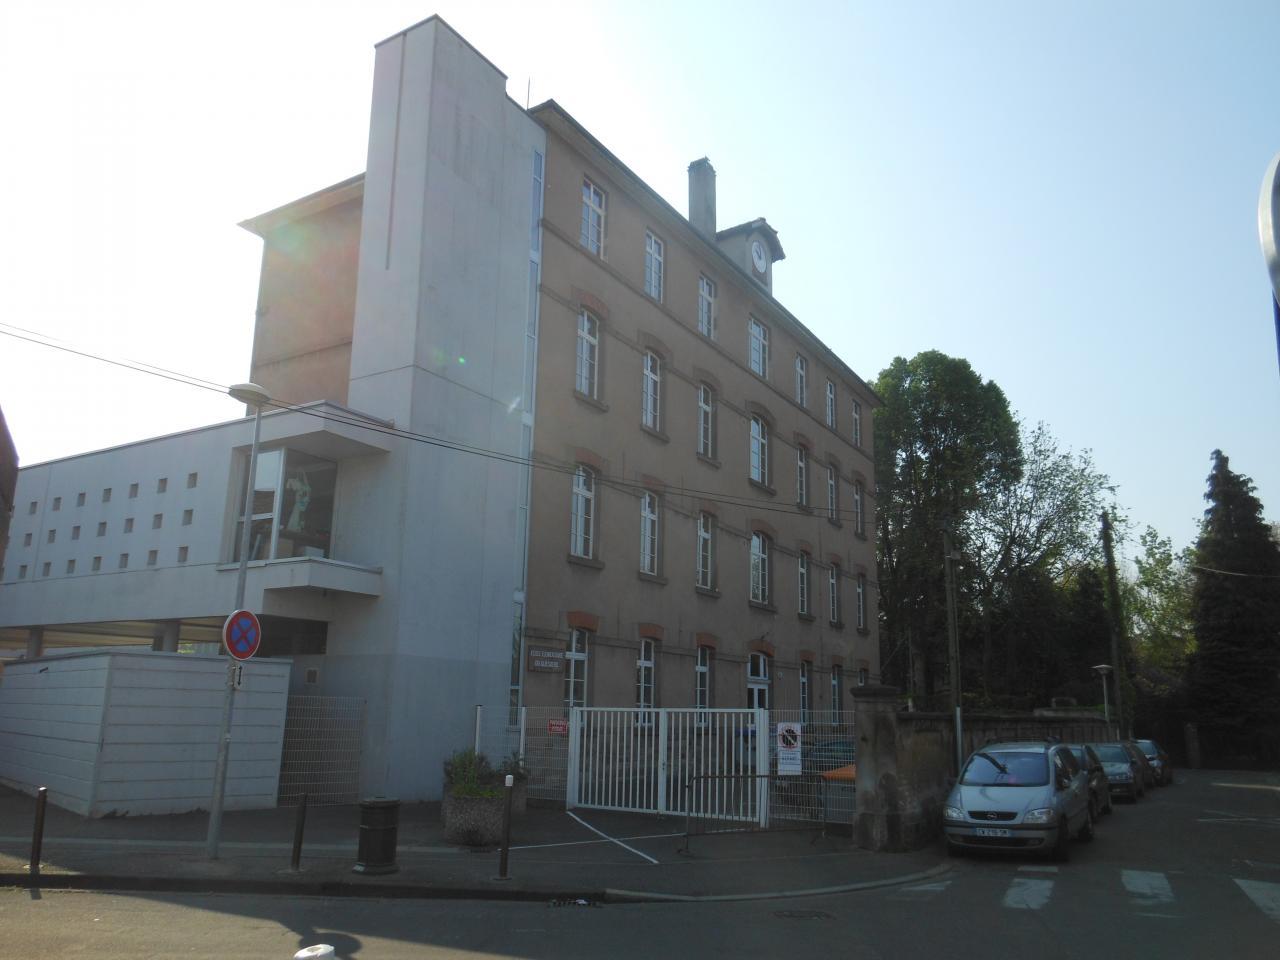 Ecole du Gliesberg